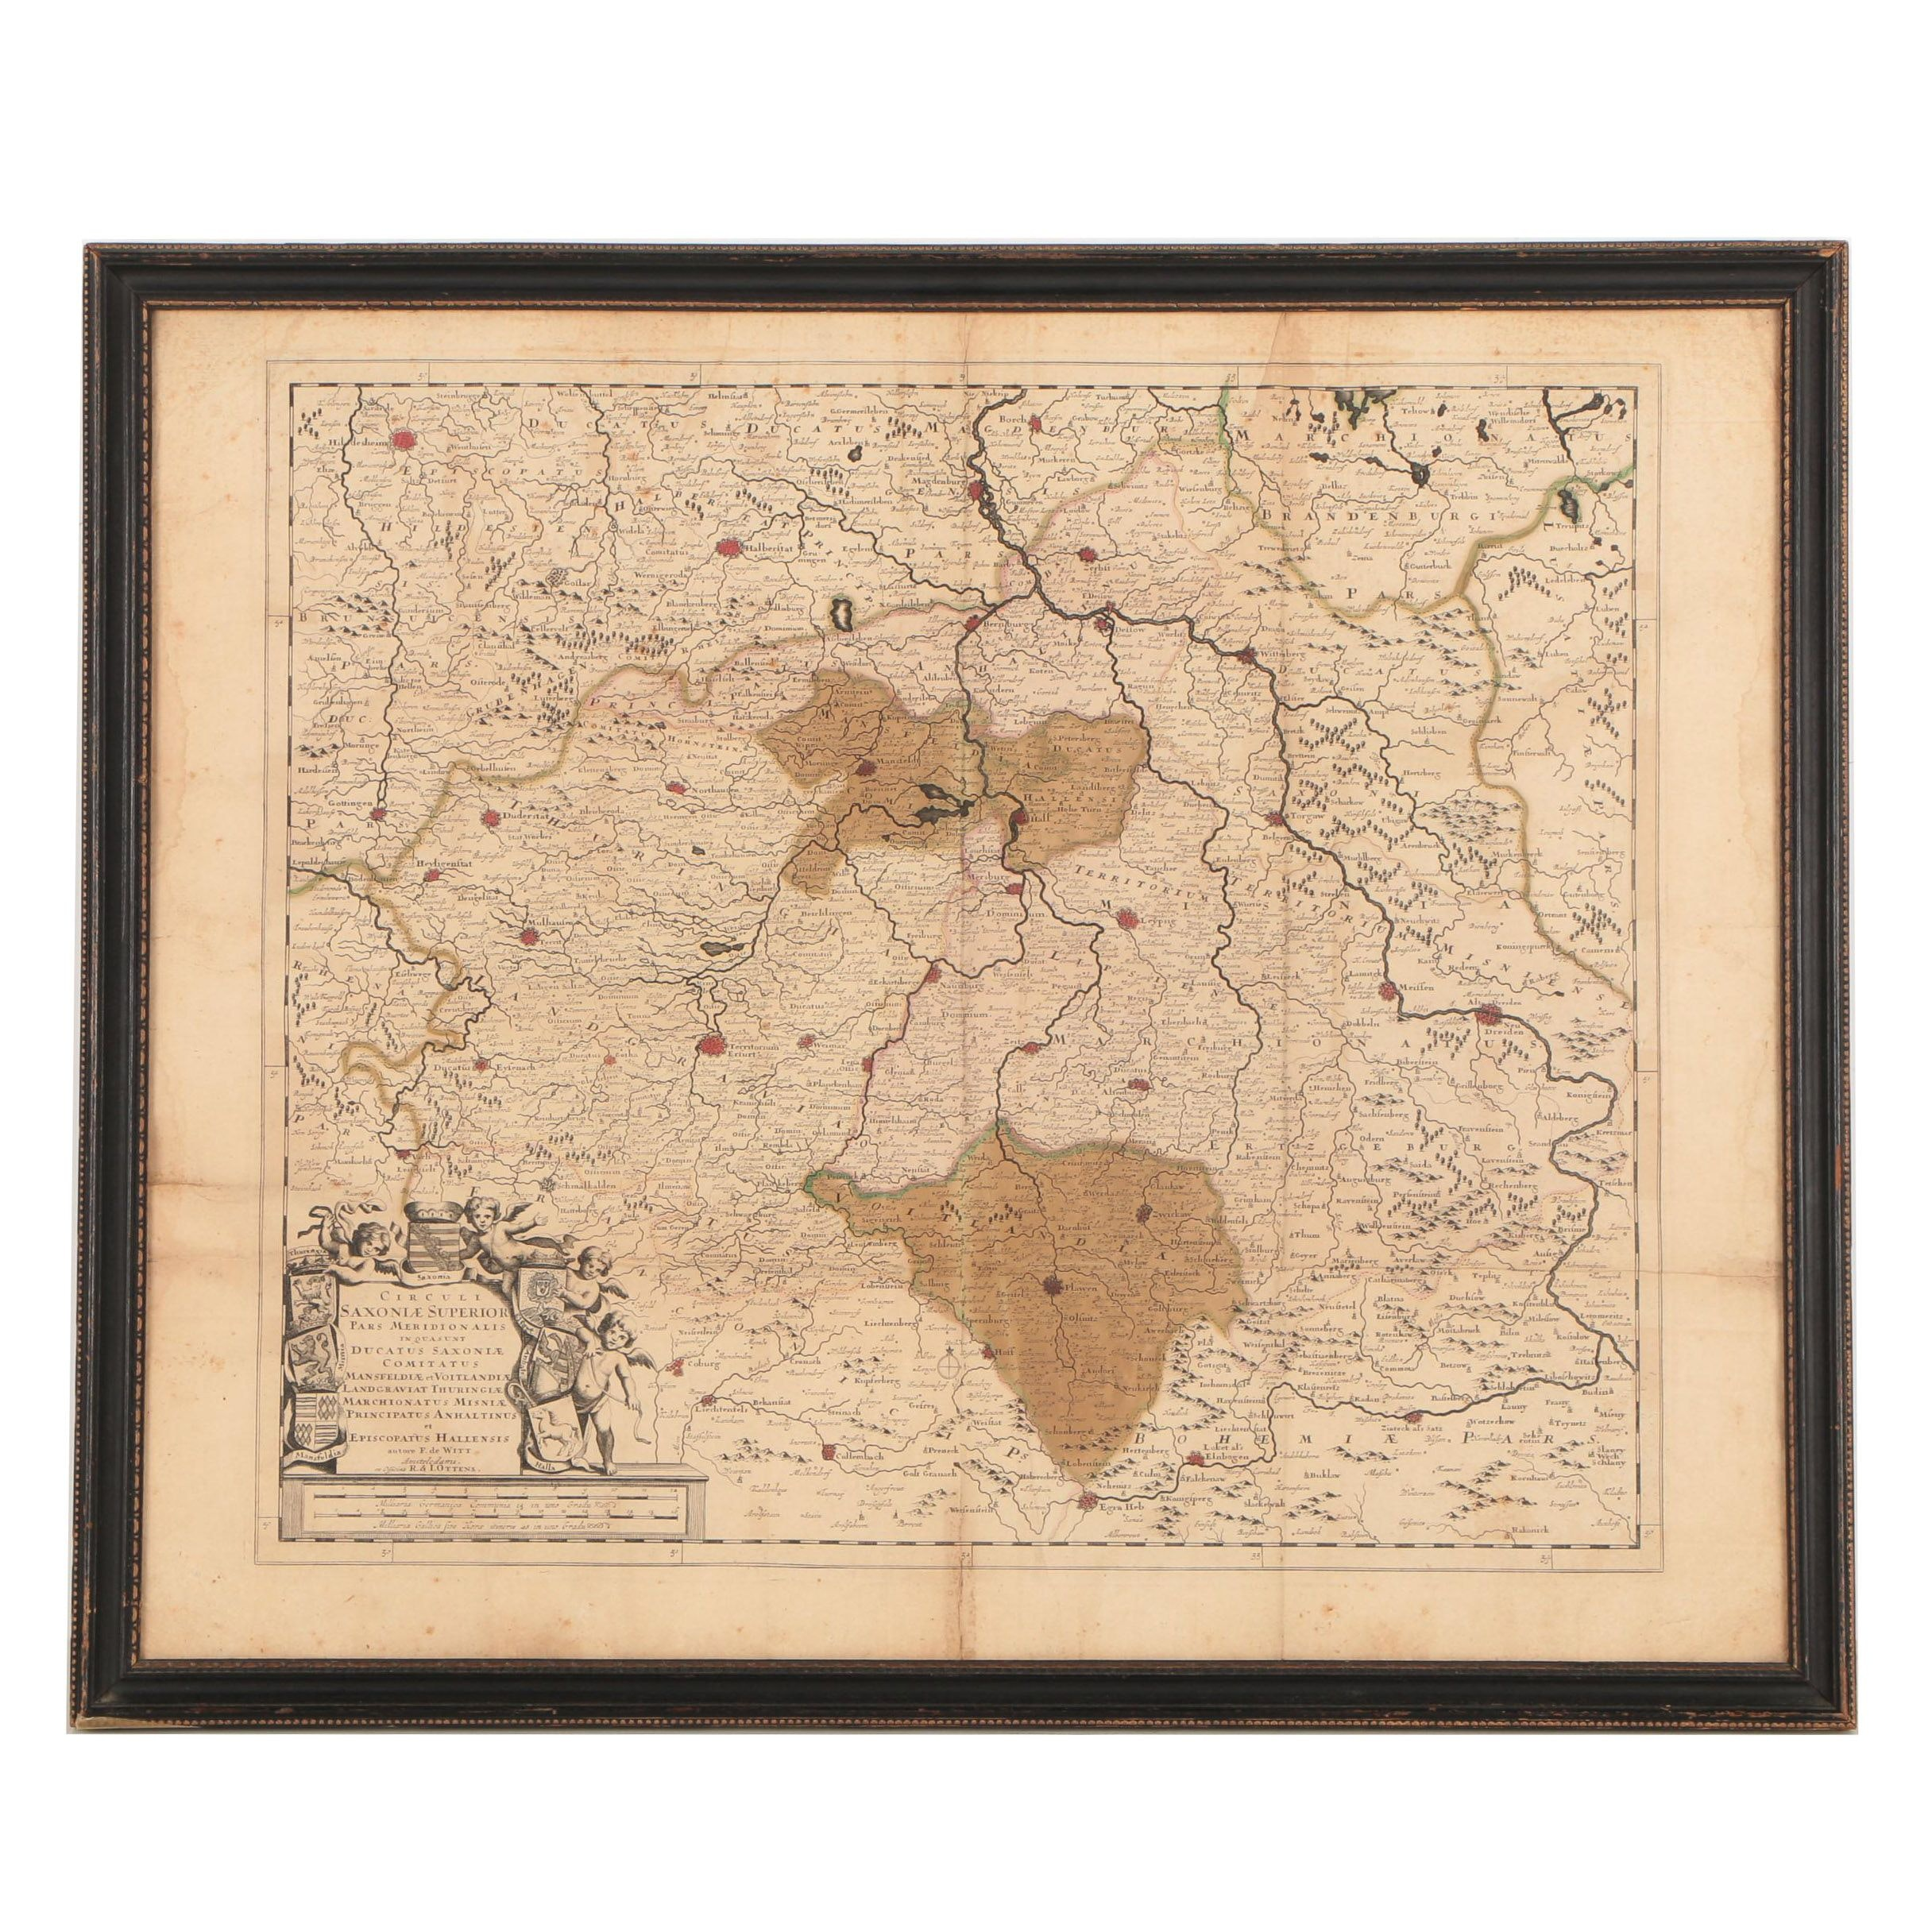 F. de Witt Antique Engraved Map of Saxony